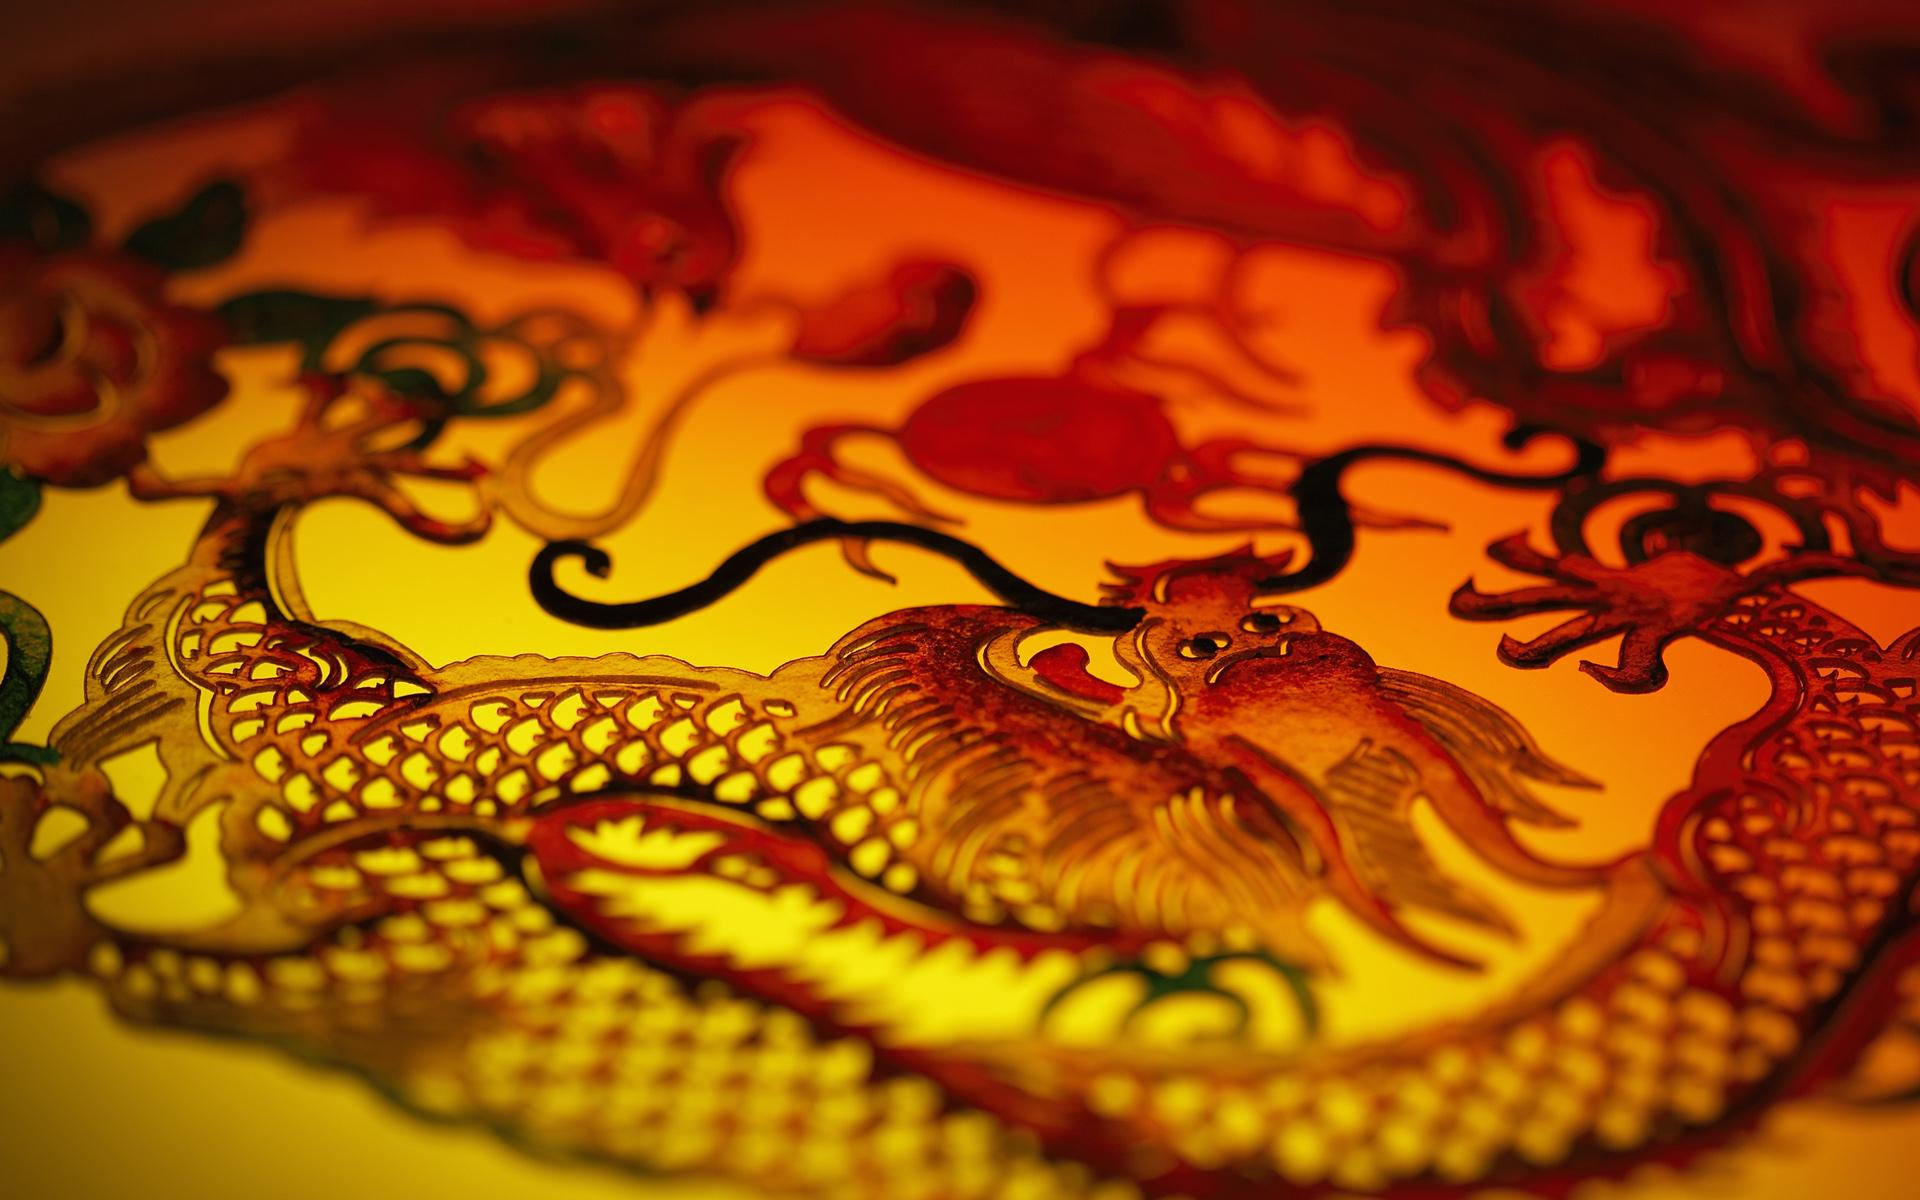 Fantasy dragon asian oriental art wallpaper 1920x1200 for Oriental wallpaper